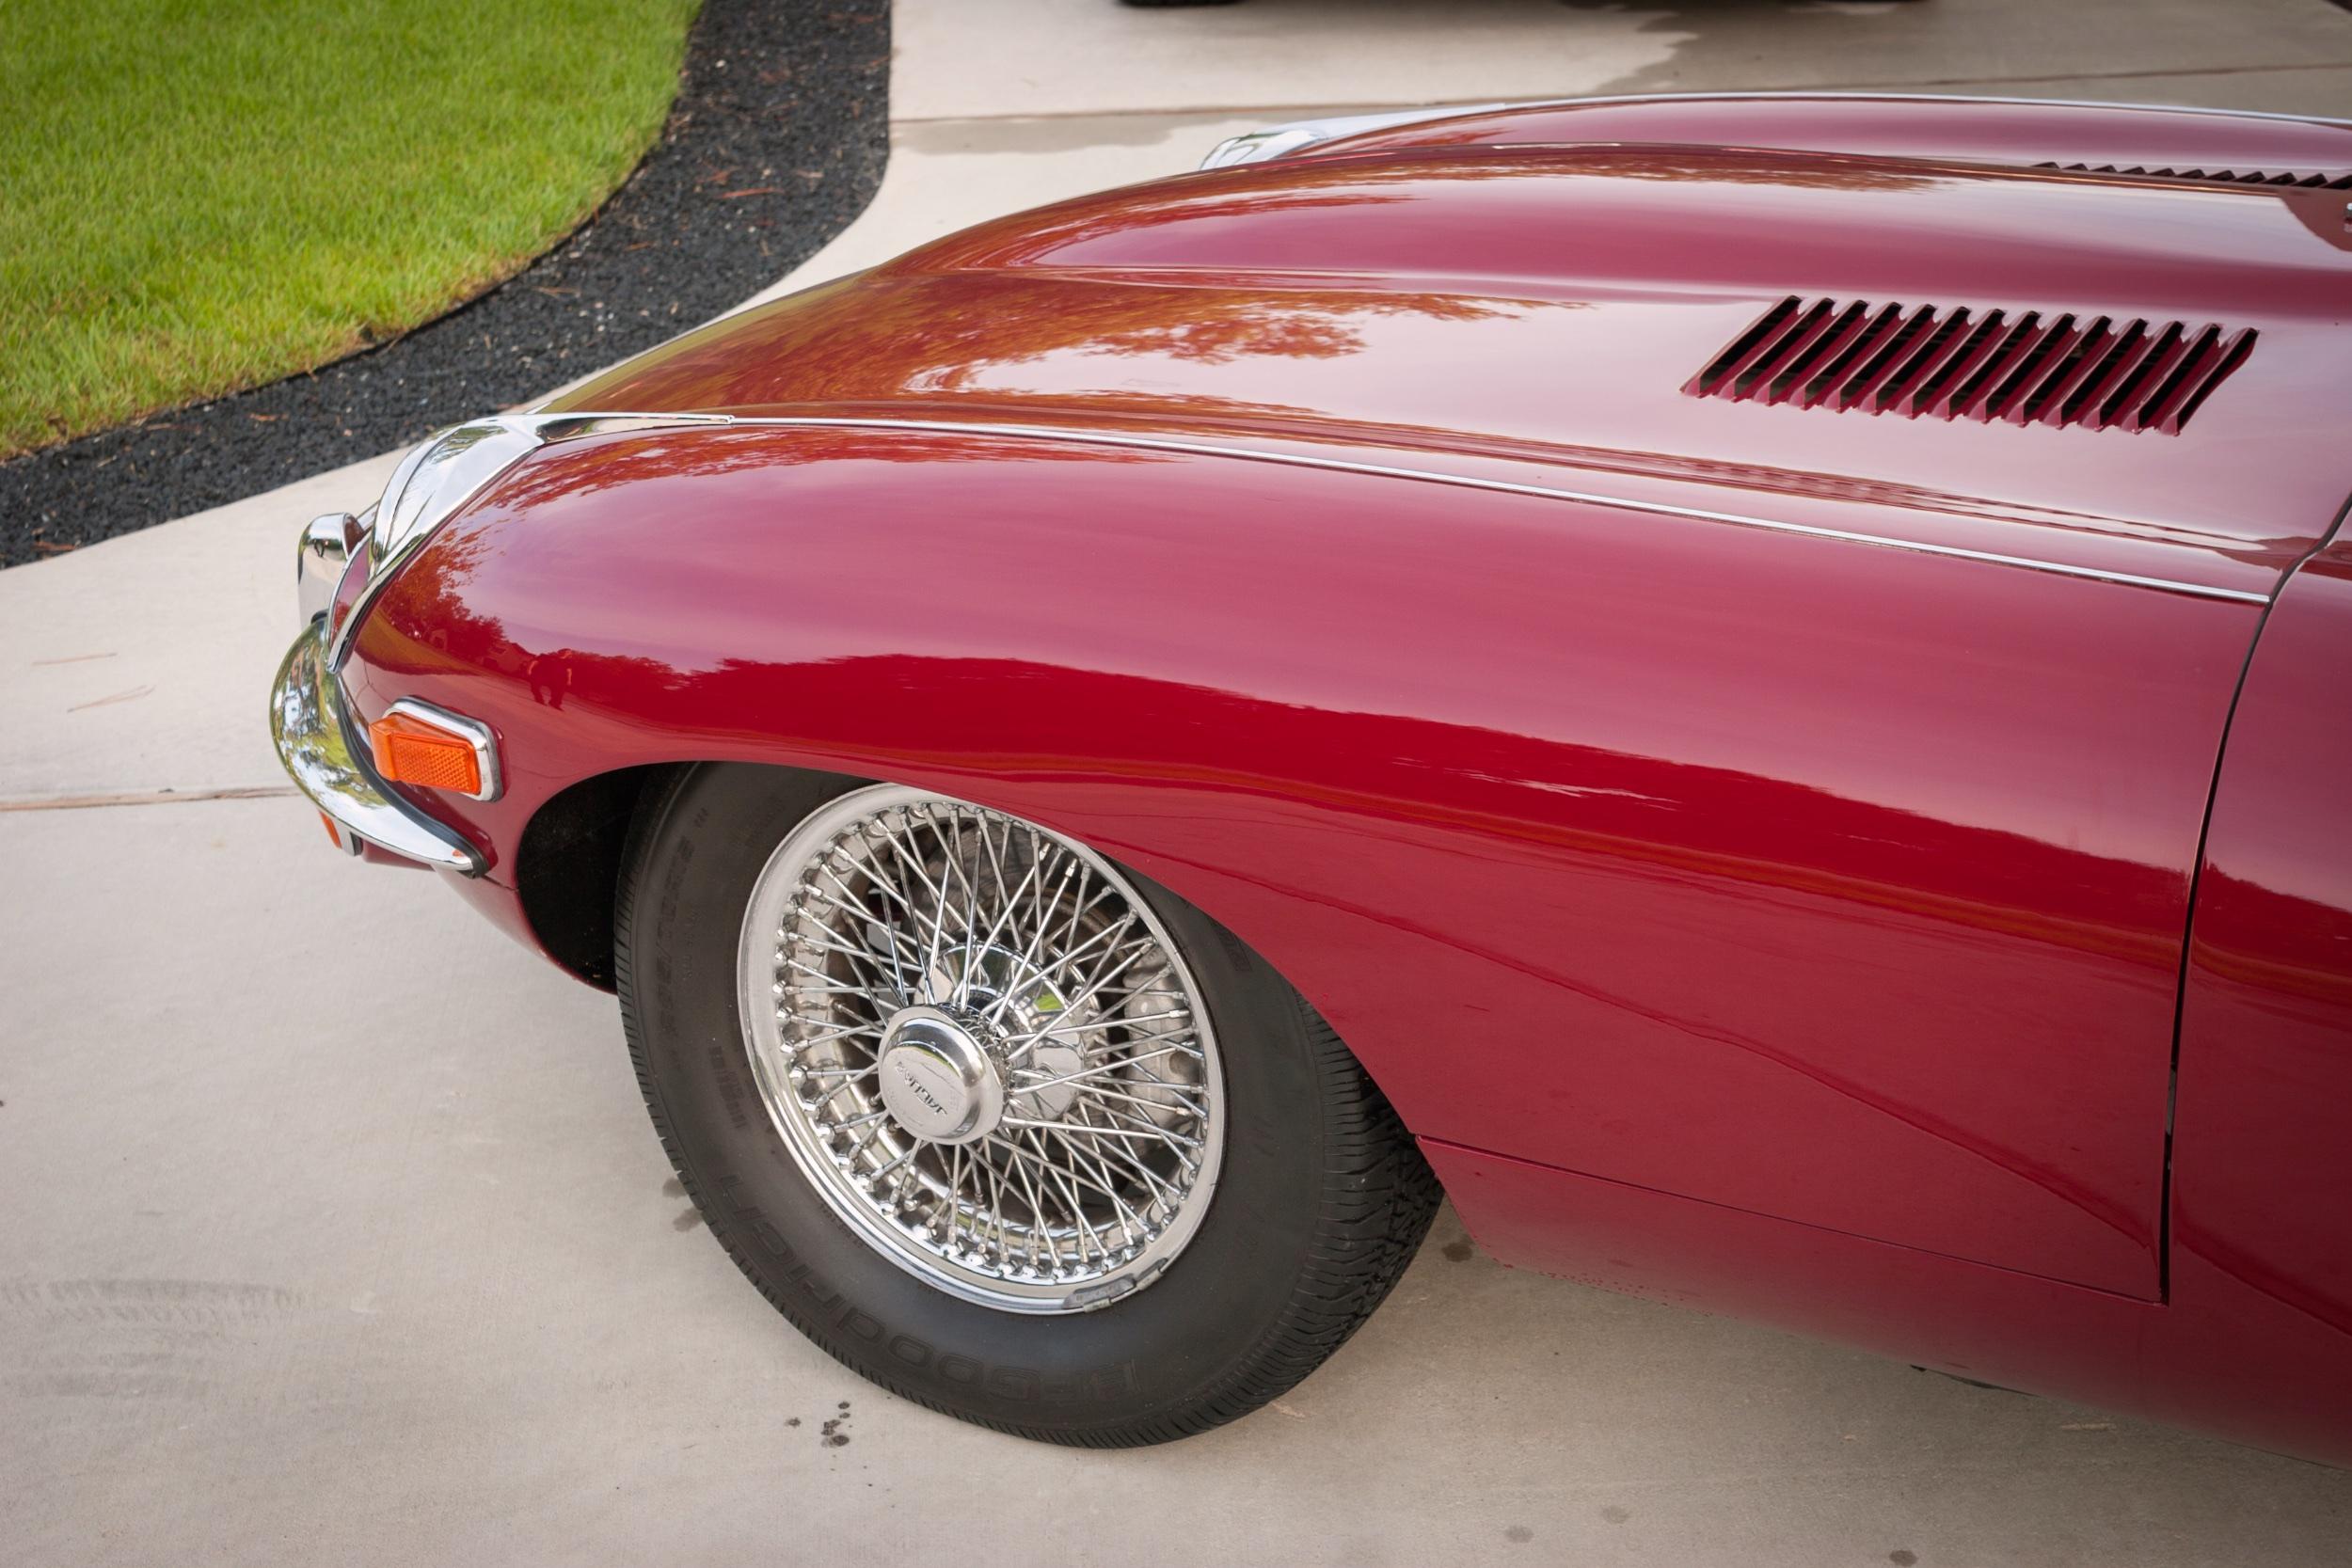 012_Jaguar_XKE_2+2_-9194.jpg